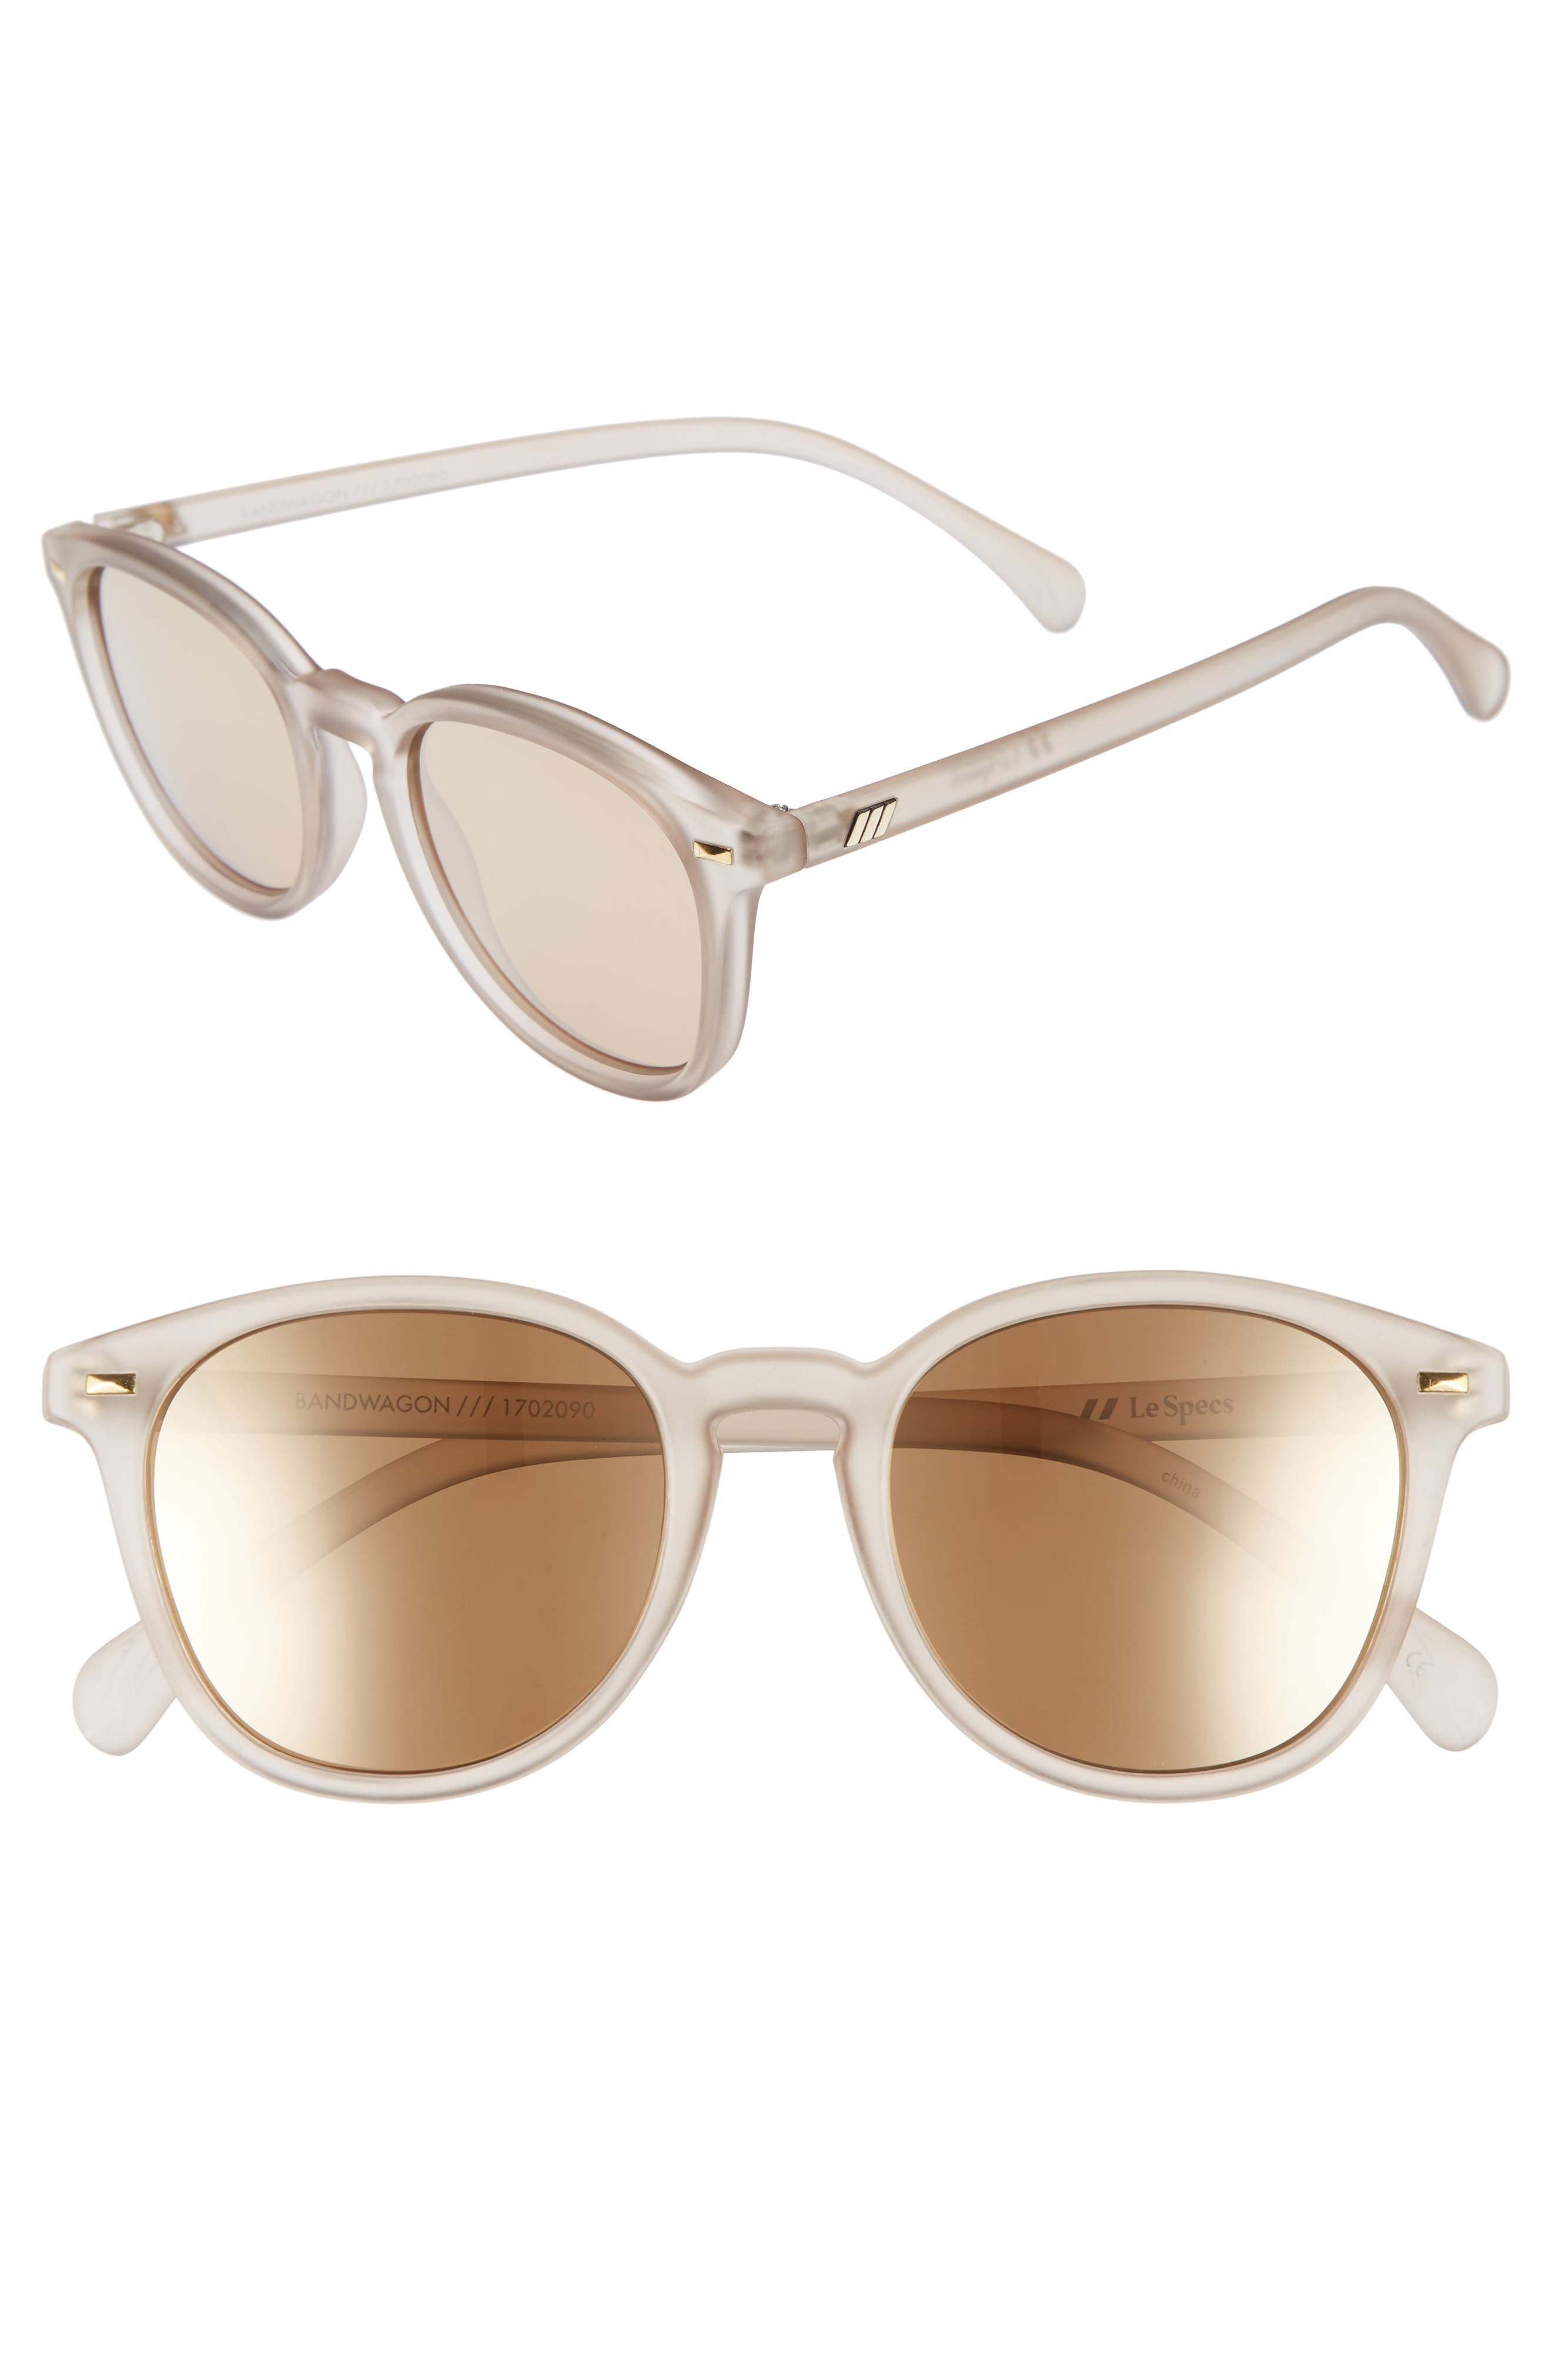 'Bandwagon' 51mm Sunglasses,                         Main,                         color, MATTE STONE